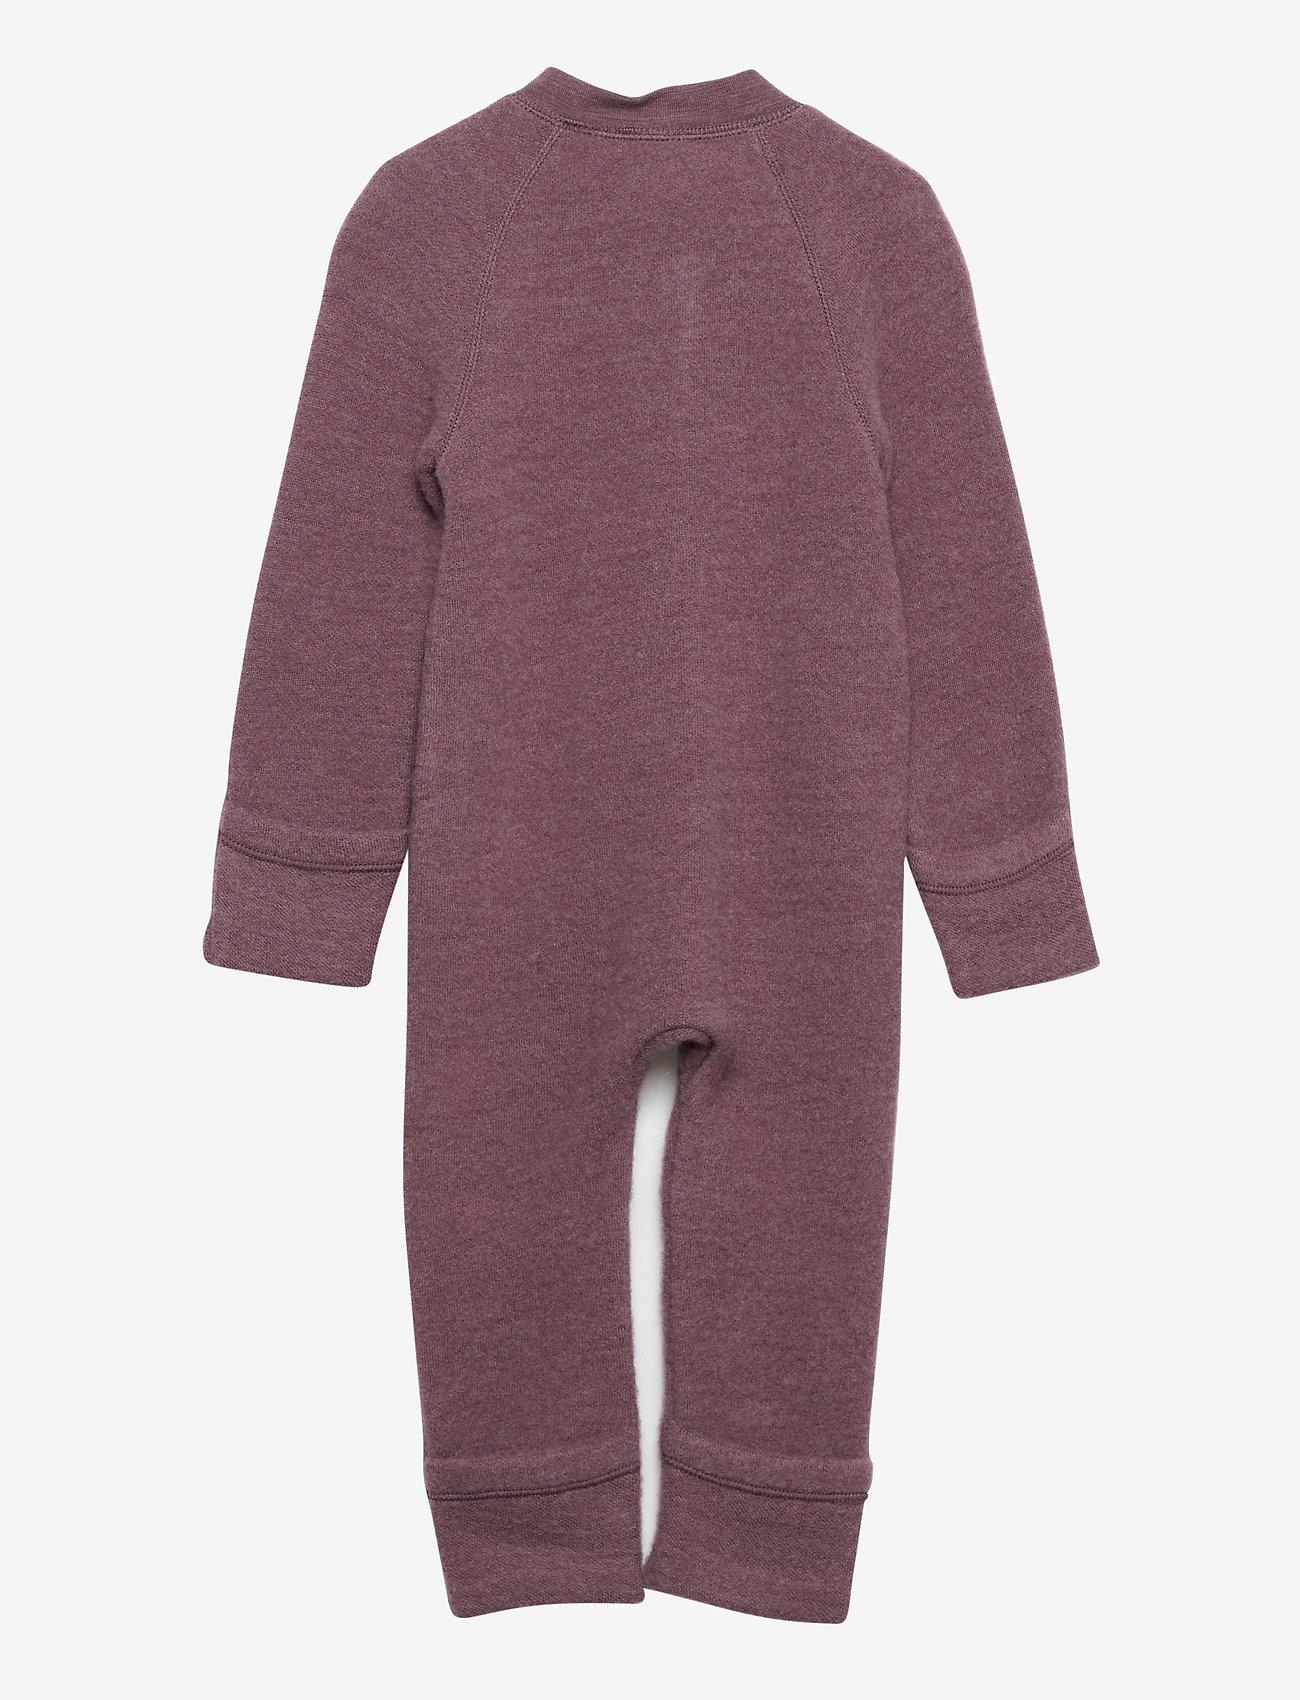 Nbfwmino Wool Bru Ls Suit Xx (Flint) (44.99 €) - name it W3KGg